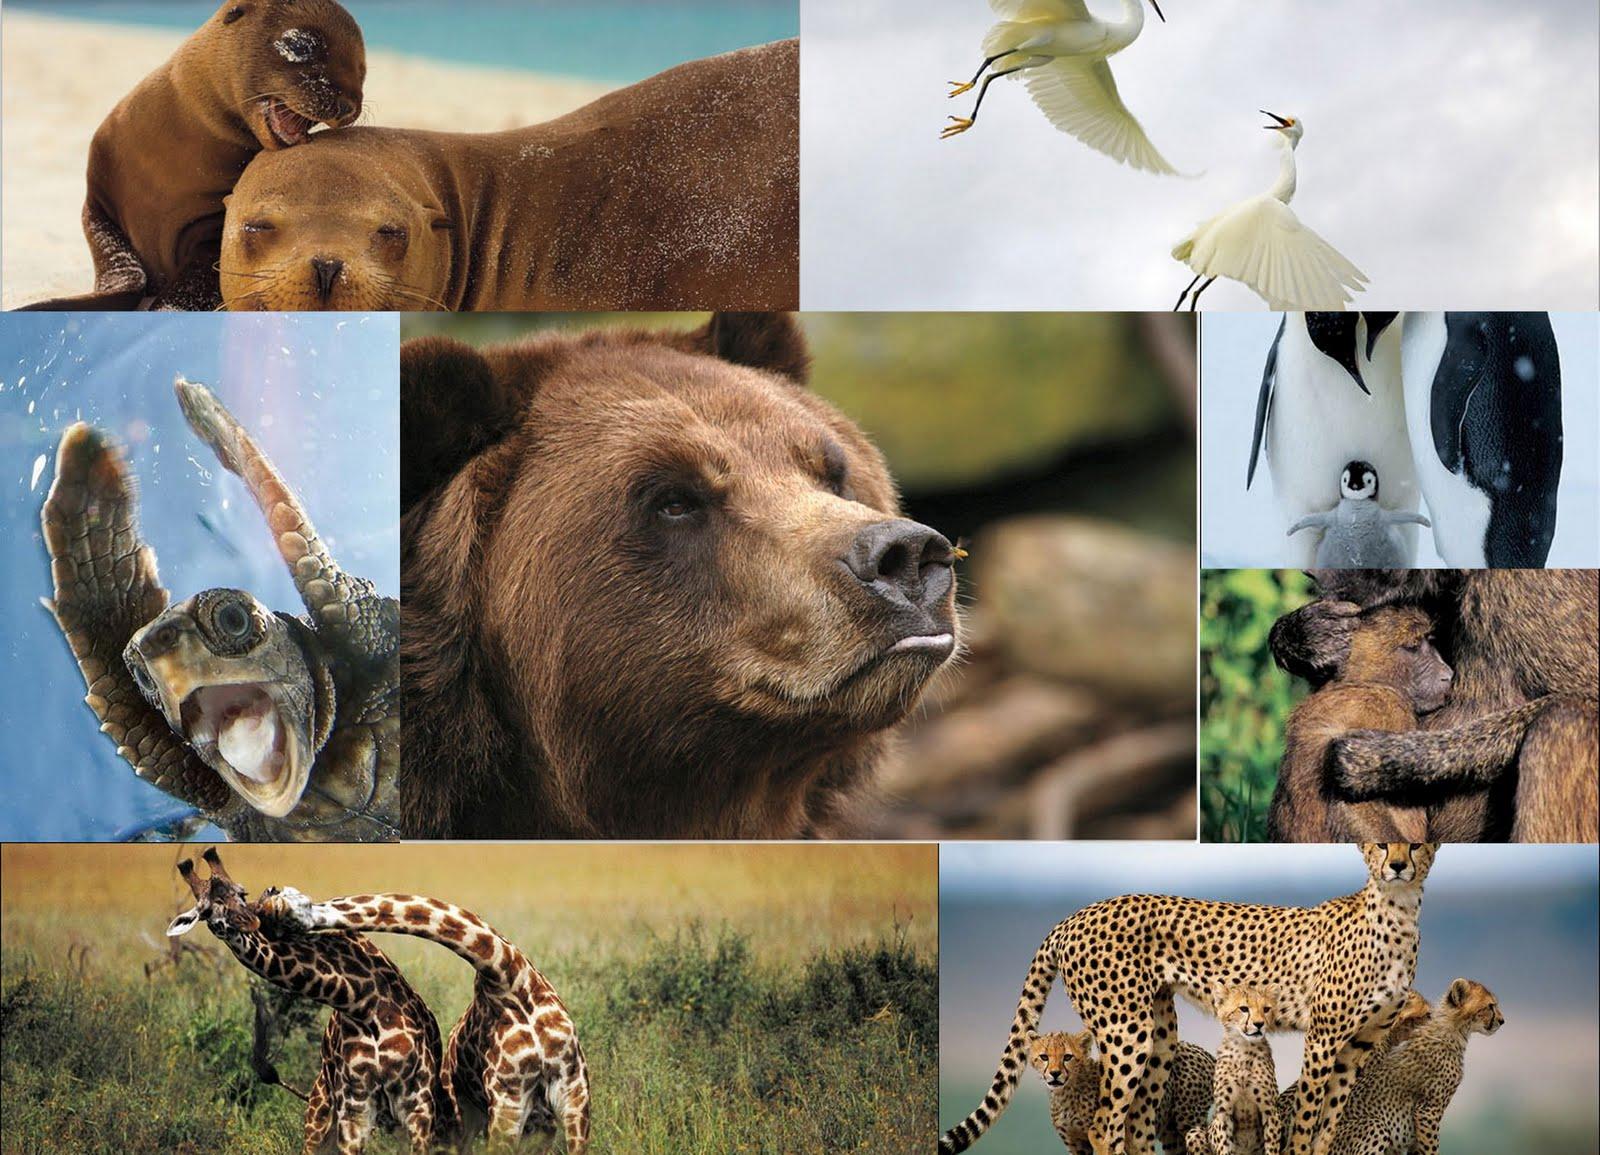 biodiversity_zoologia_inspiracion_montessori_method_inspiration_education